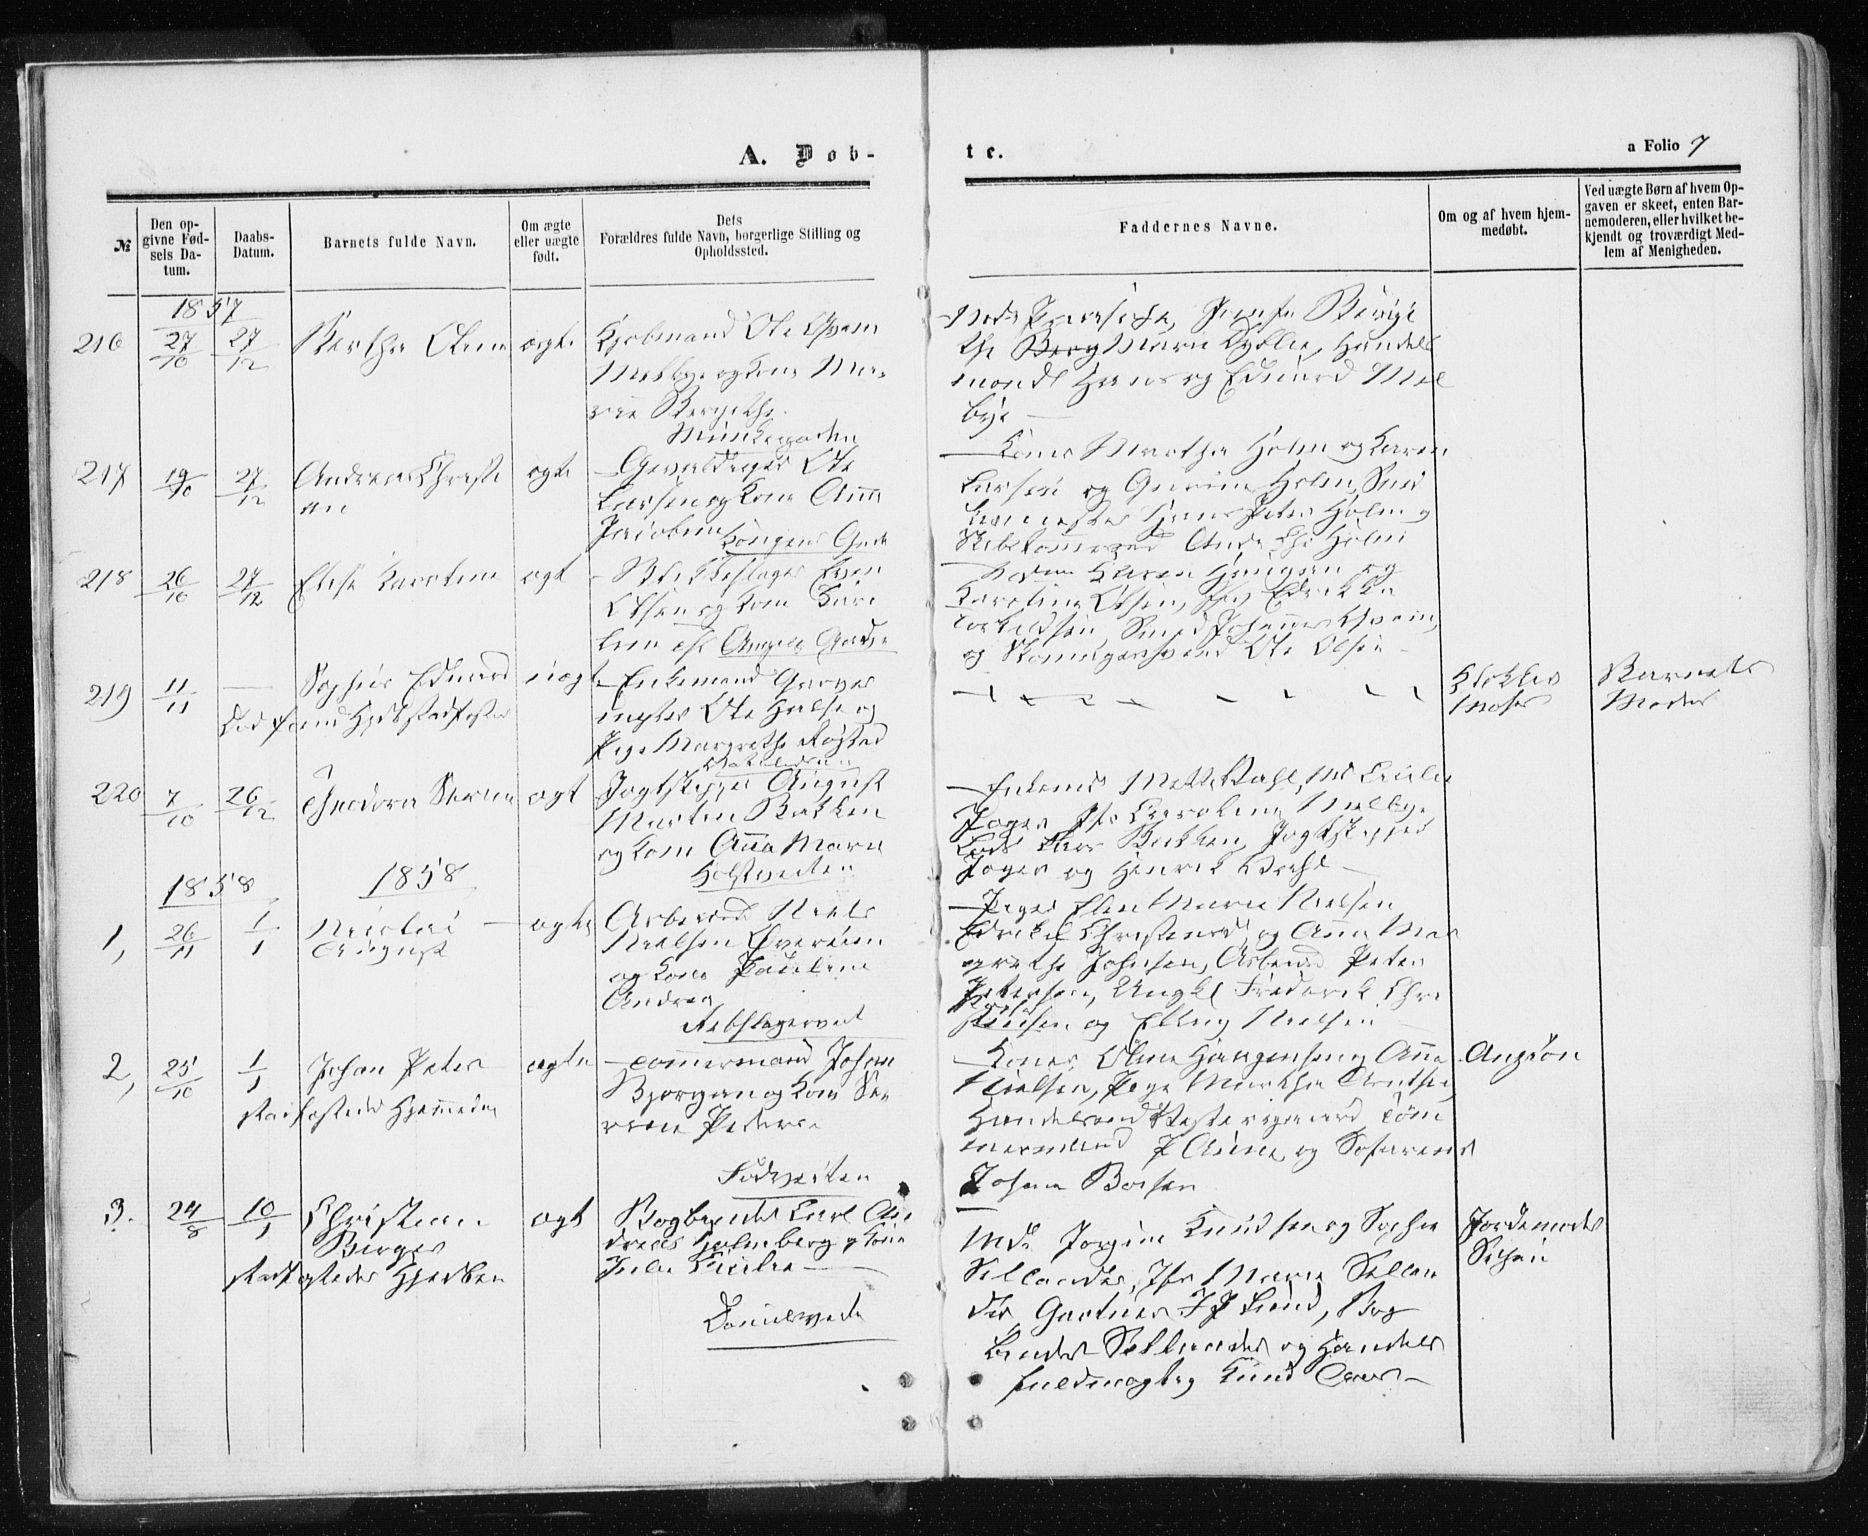 SAT, Ministerialprotokoller, klokkerbøker og fødselsregistre - Sør-Trøndelag, 601/L0053: Parish register (official) no. 601A21, 1857-1865, p. 7